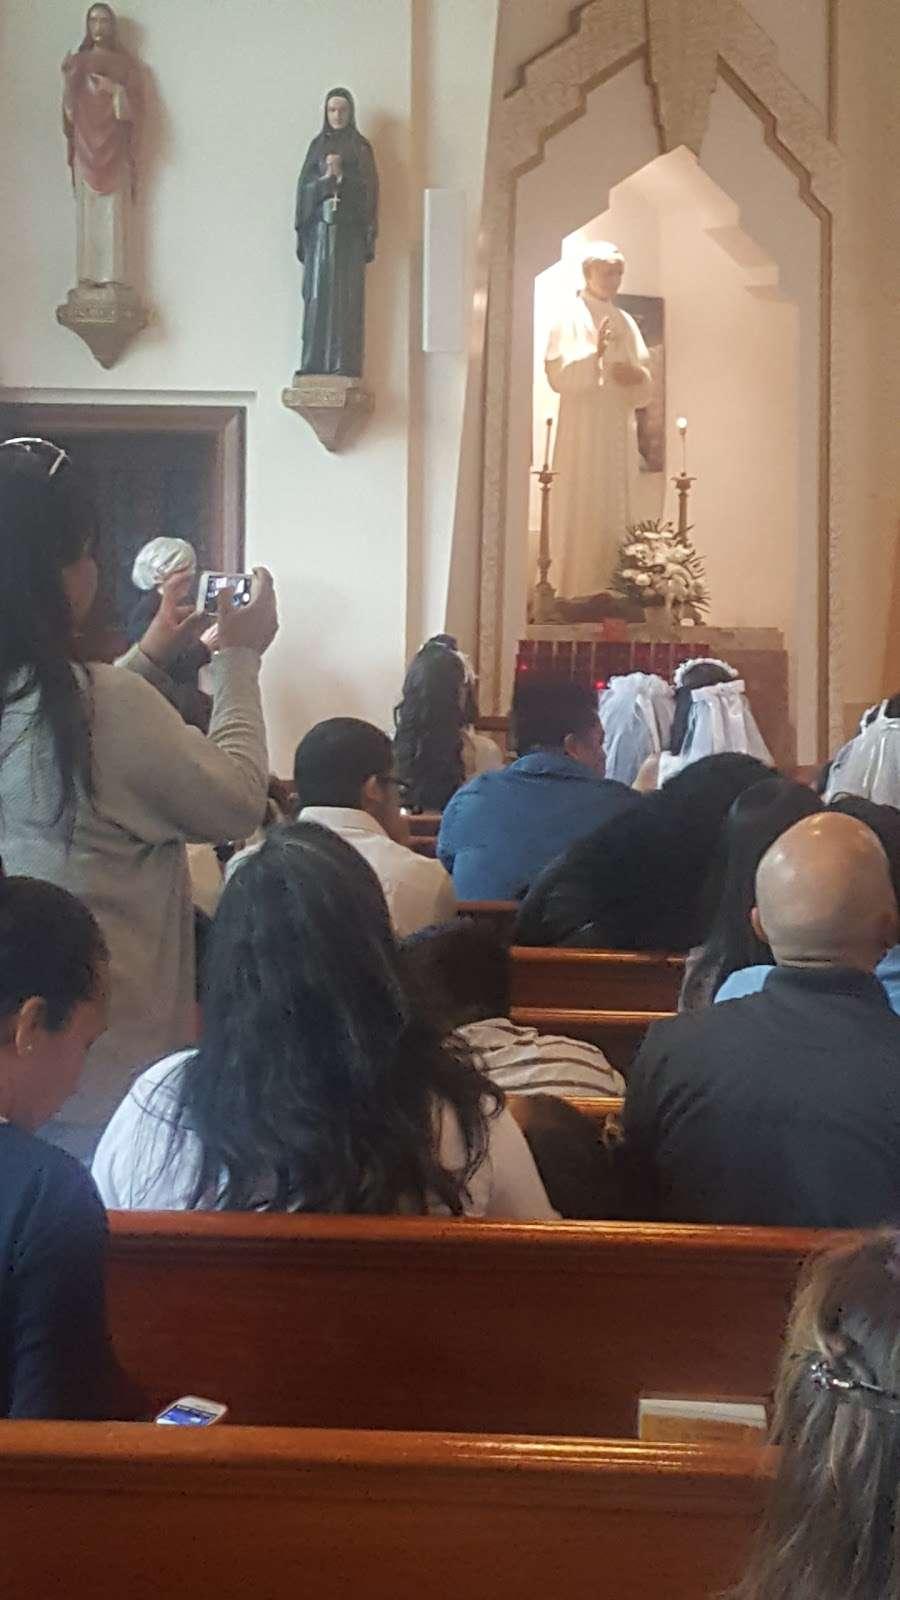 St Marys Winfield - church  | Photo 8 of 10 | Address: 70-31 48th Ave, Woodside, NY 11377, USA | Phone: (718) 672-4848